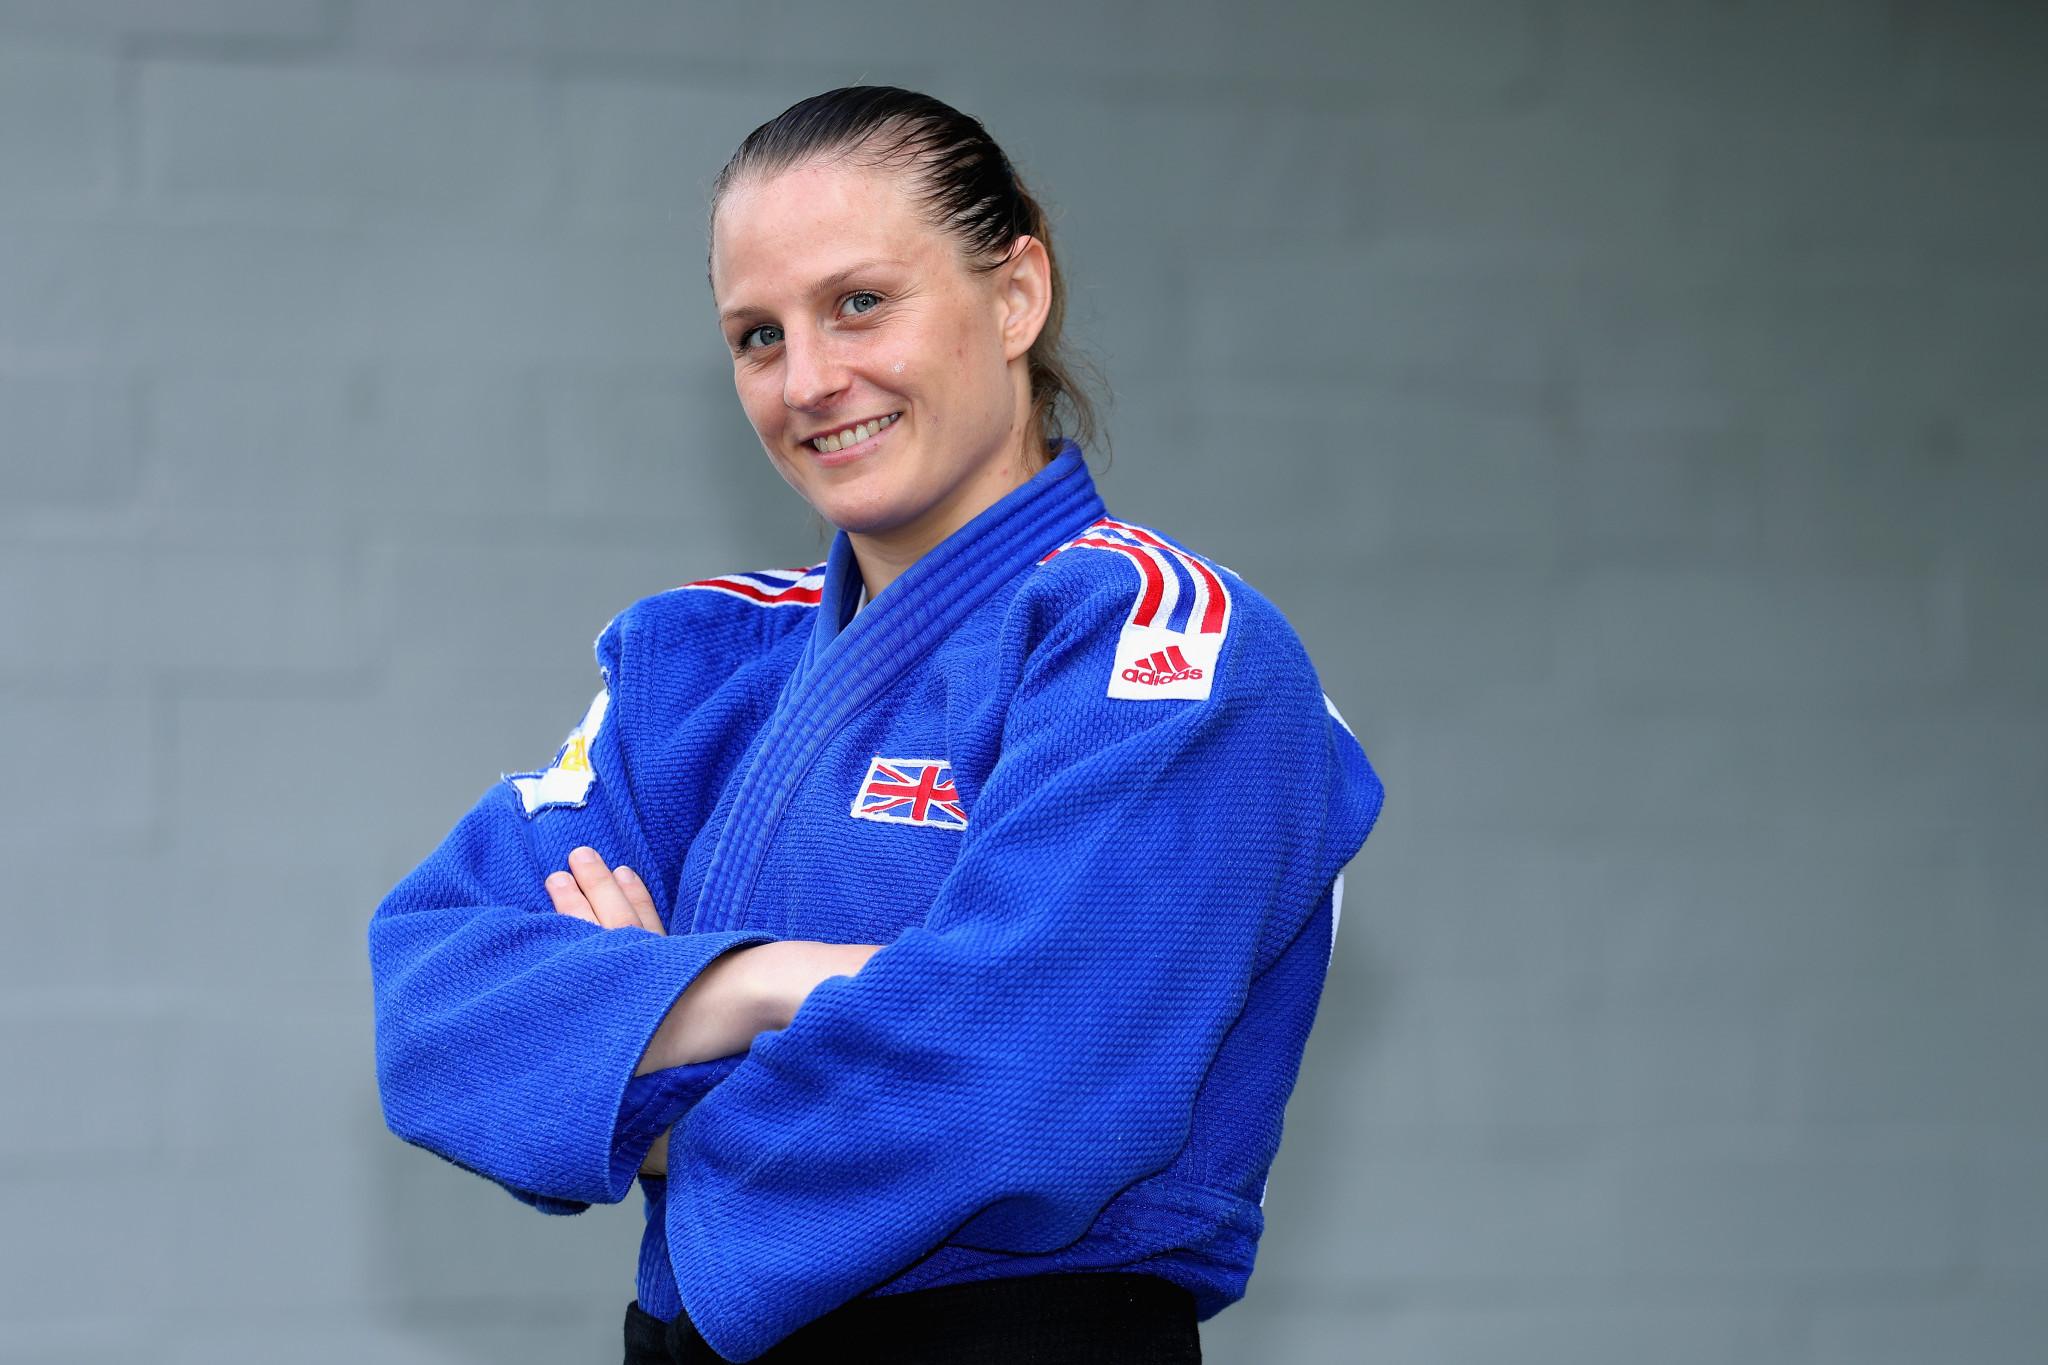 Schlesinger ends 15-year judo career to focus on university studies